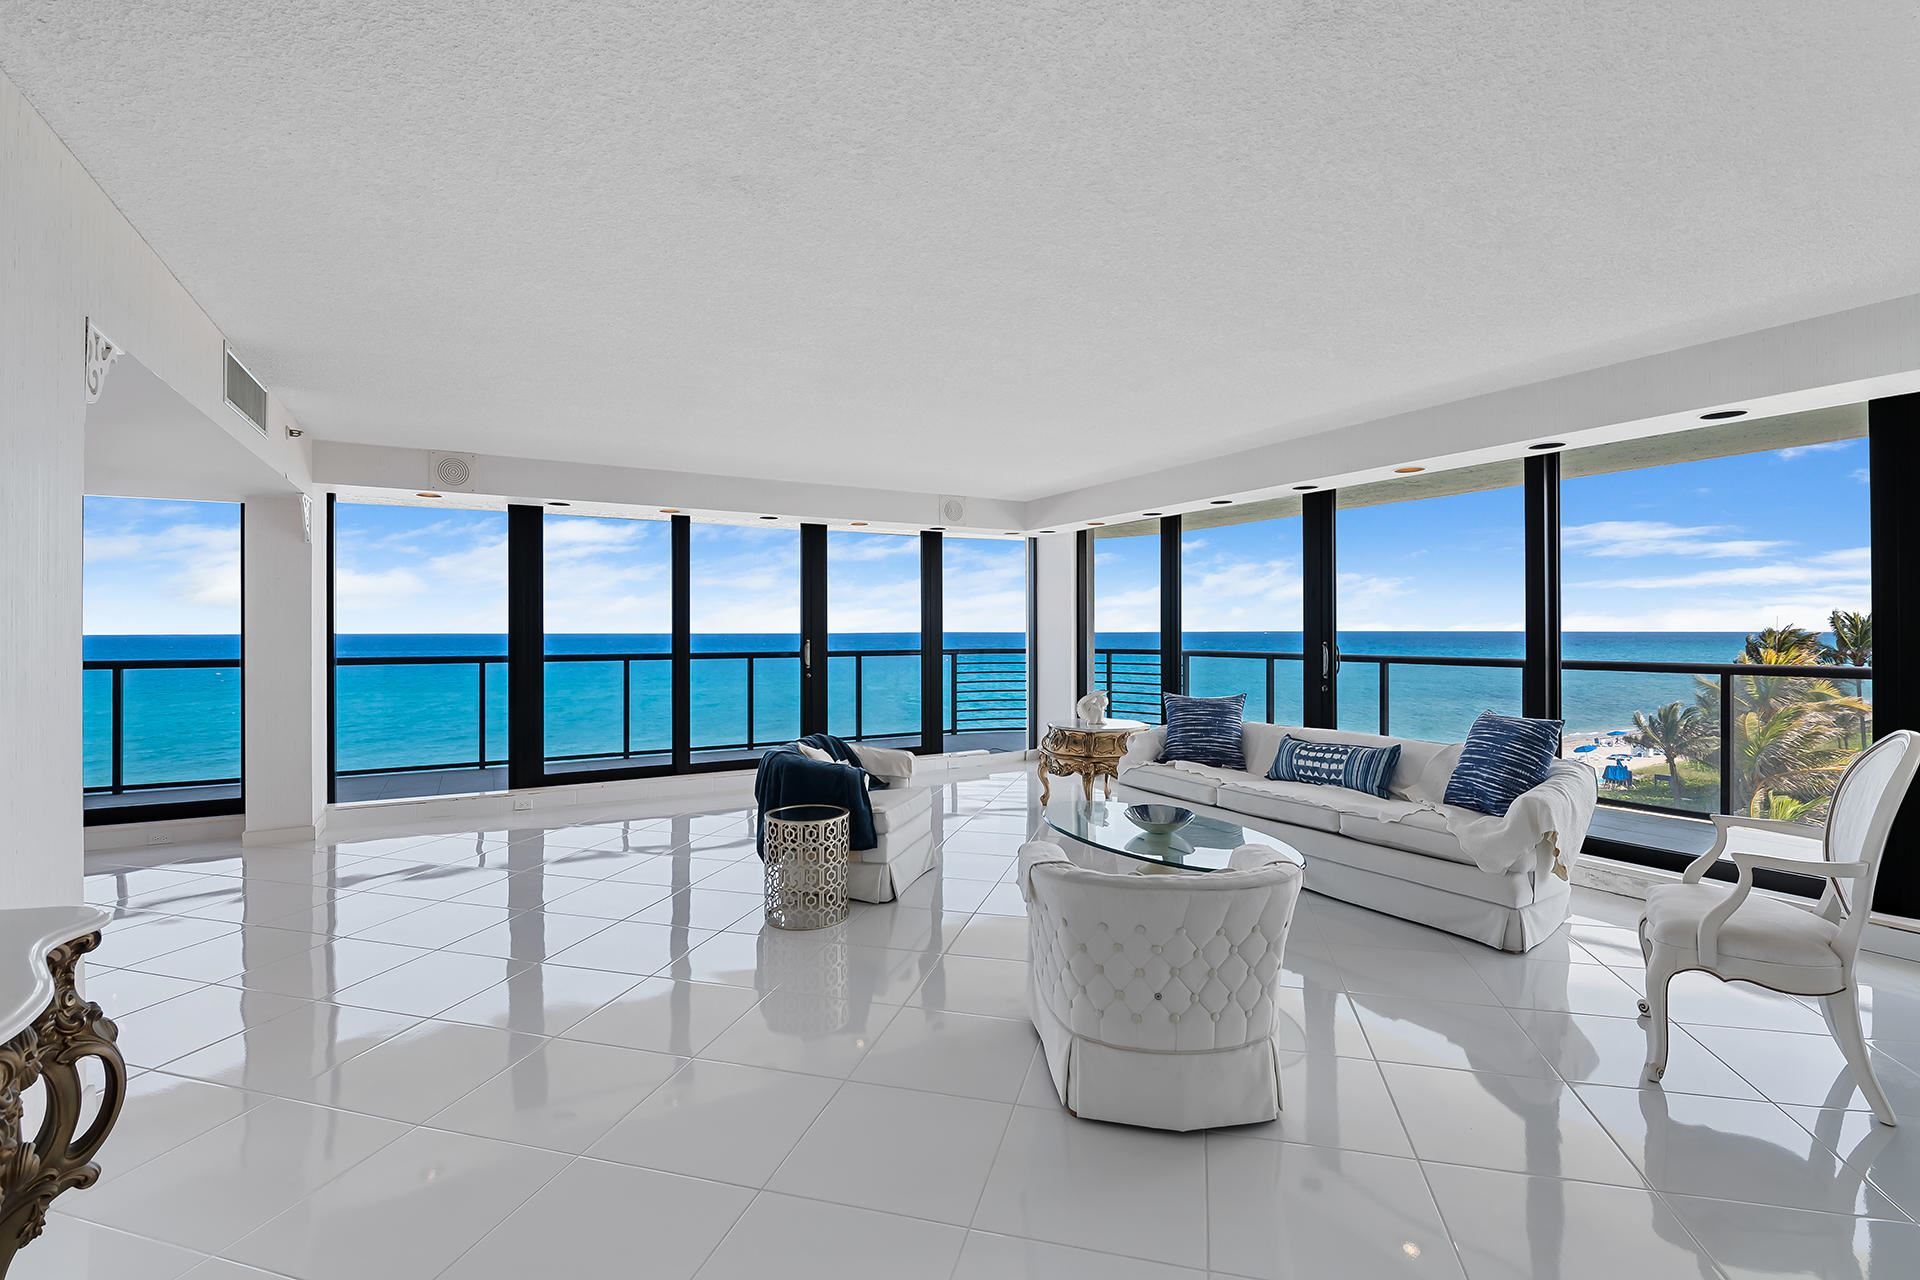 VILLA MAGNA COND Properties For Sale